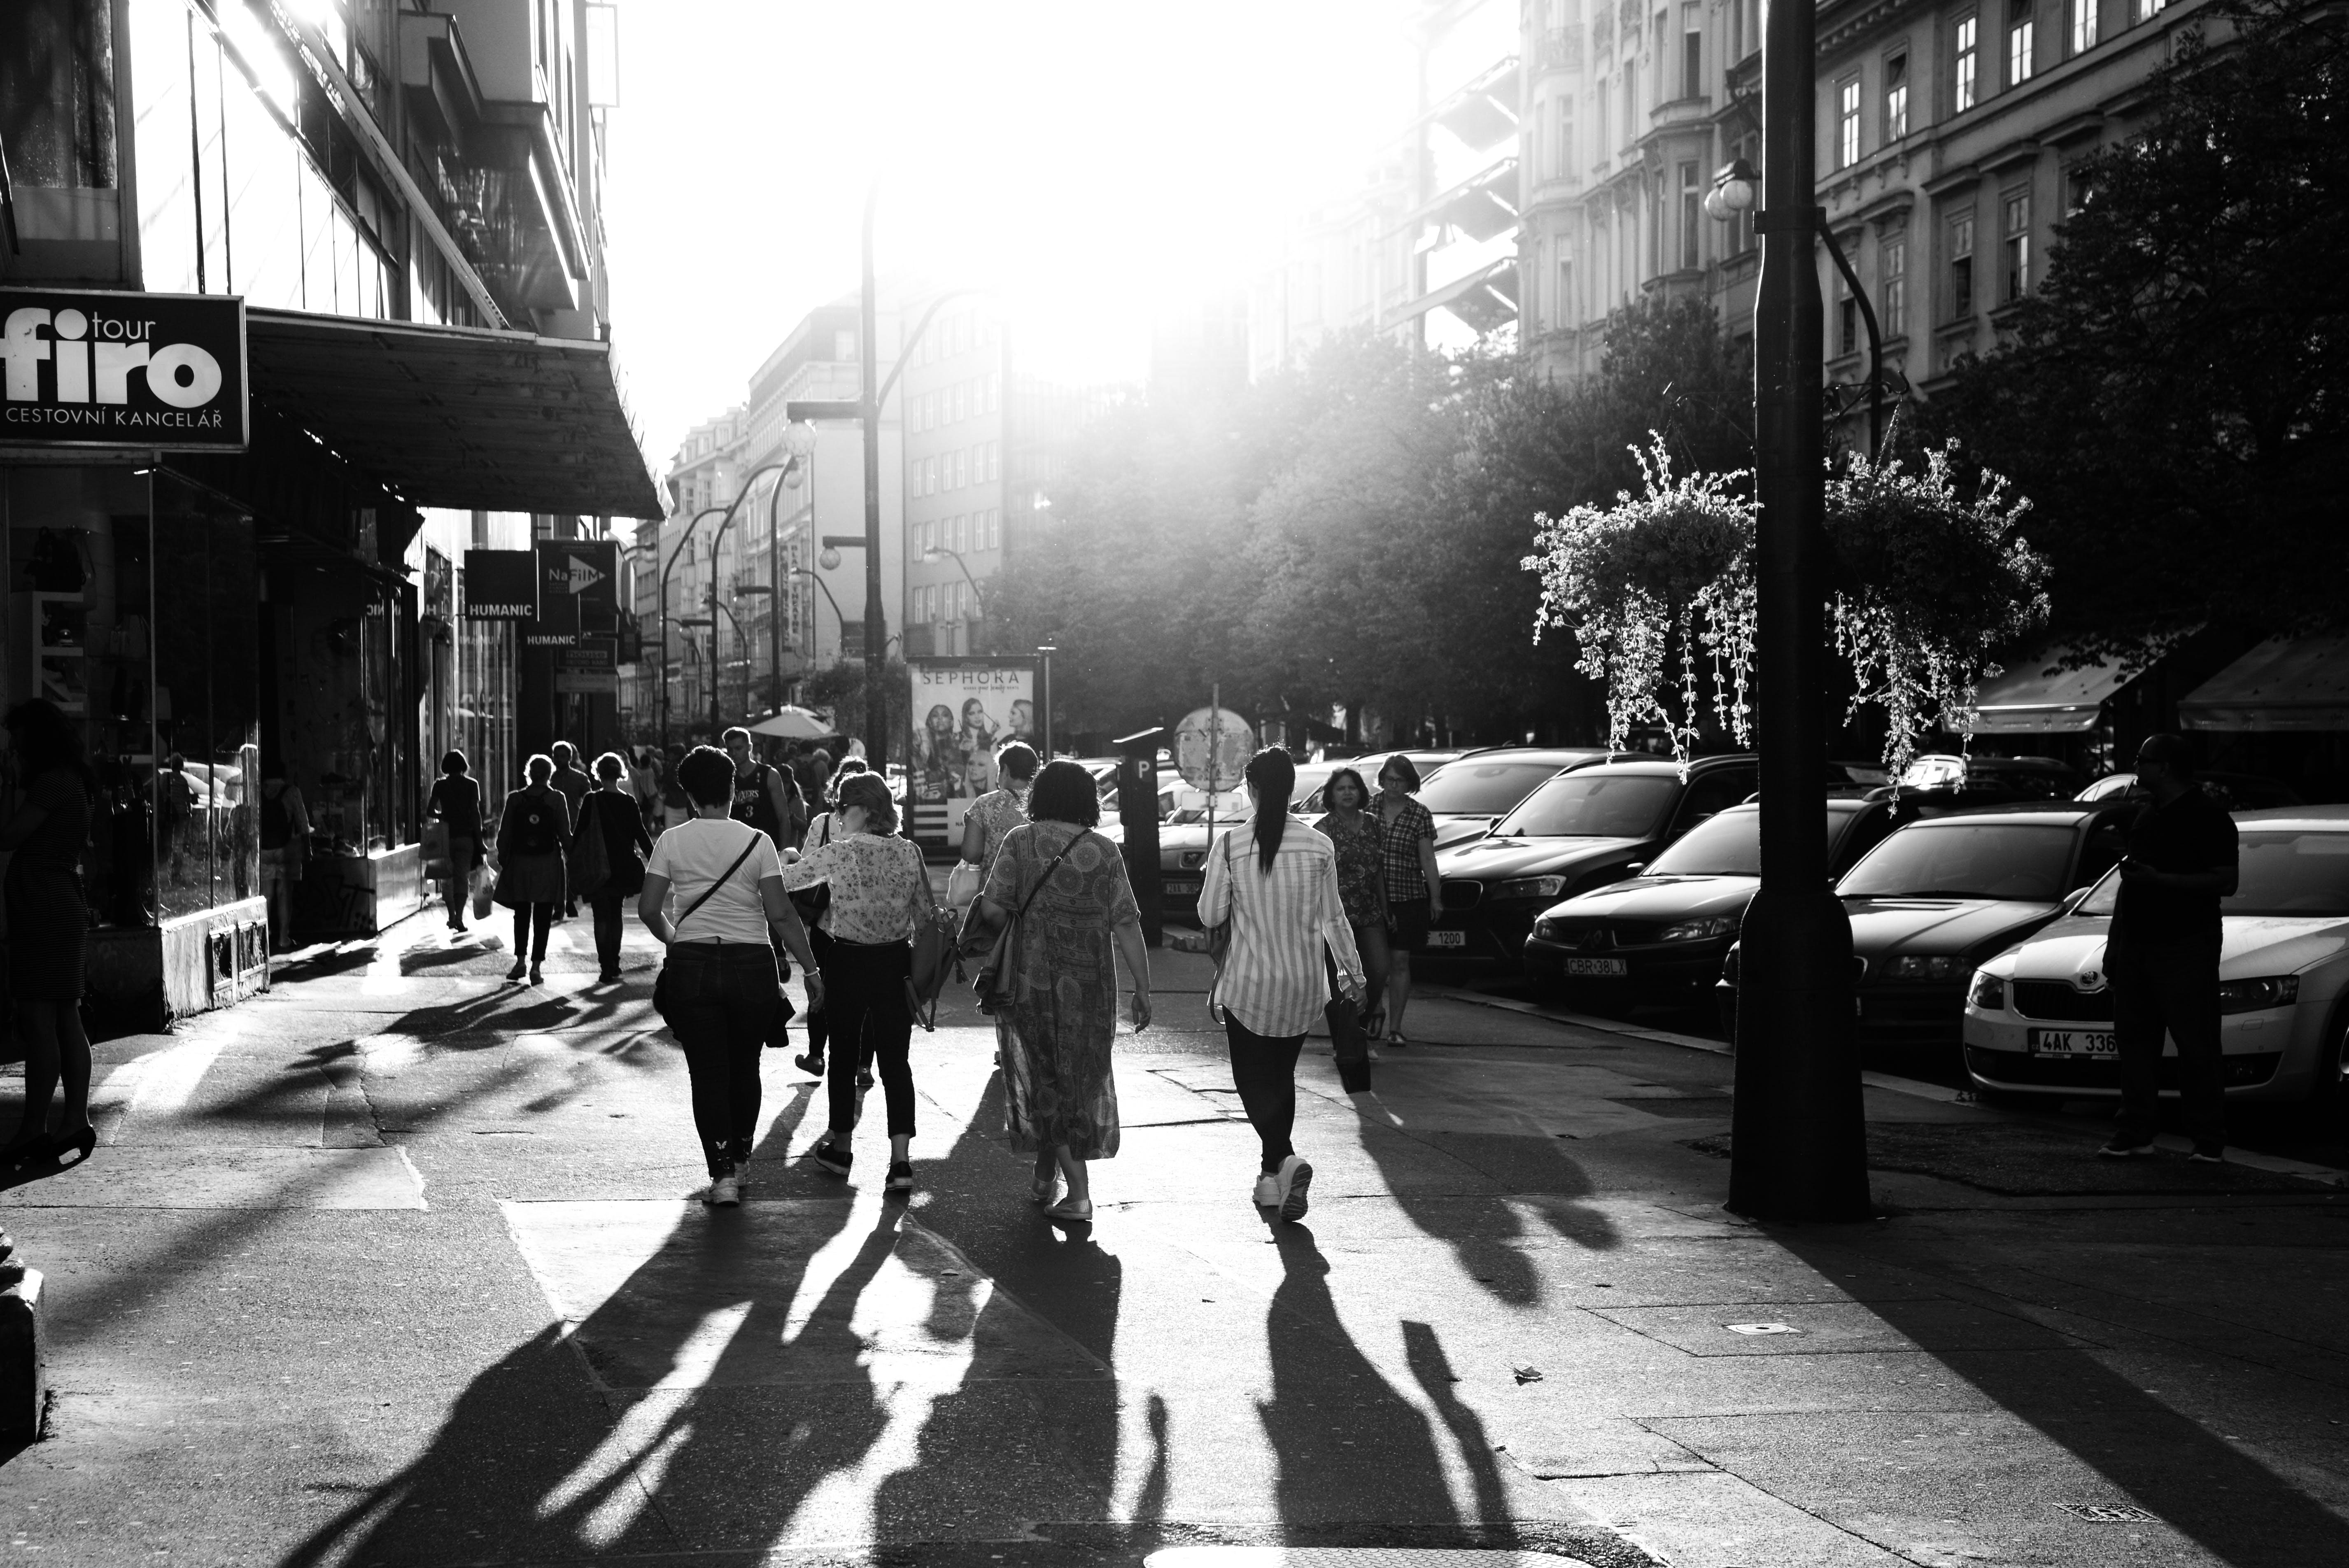 People Walking on Streets